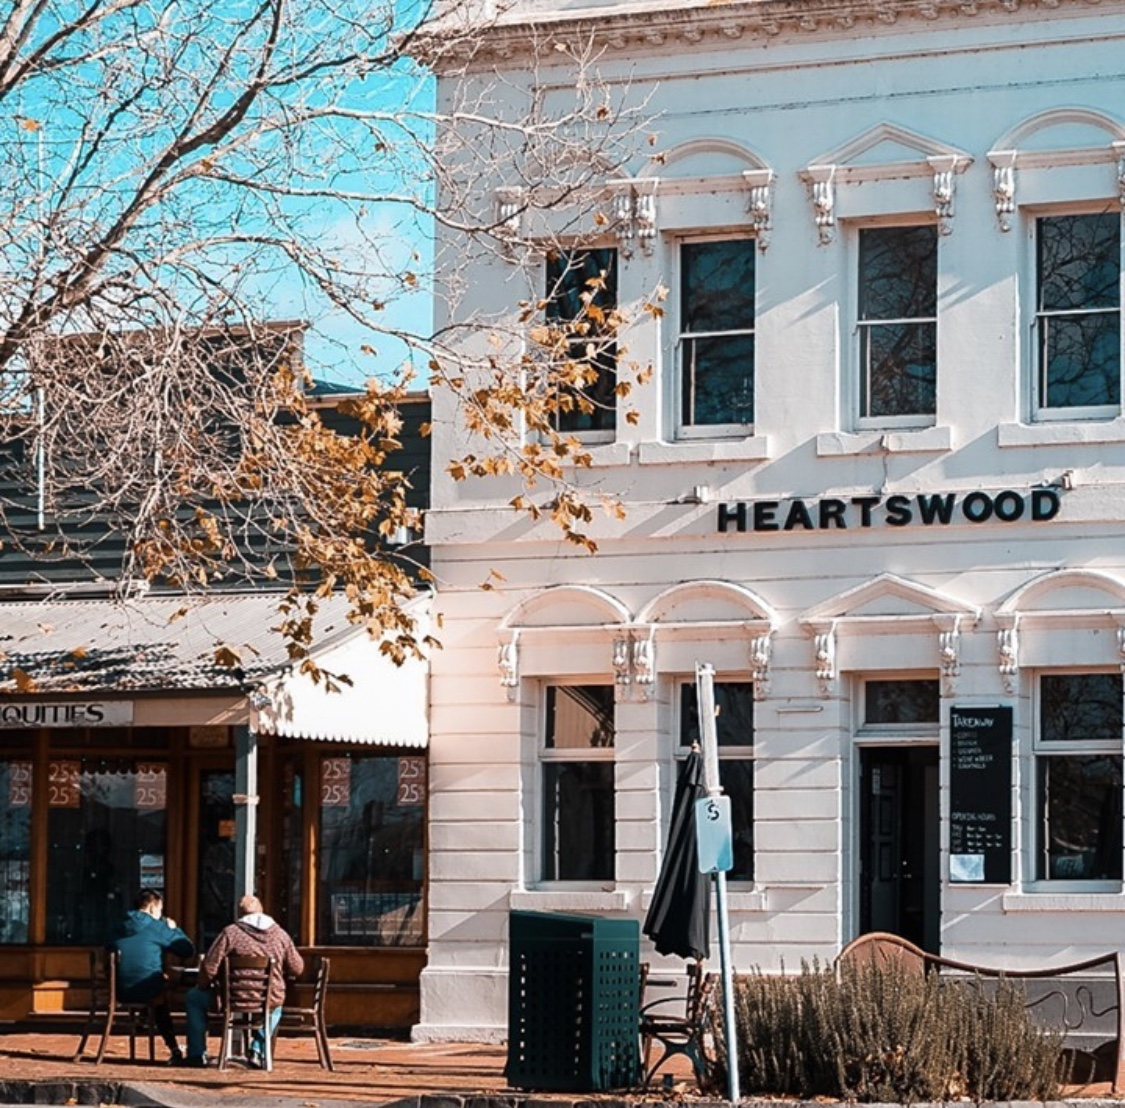 Travis Yarra Valley Guide - Heartswood